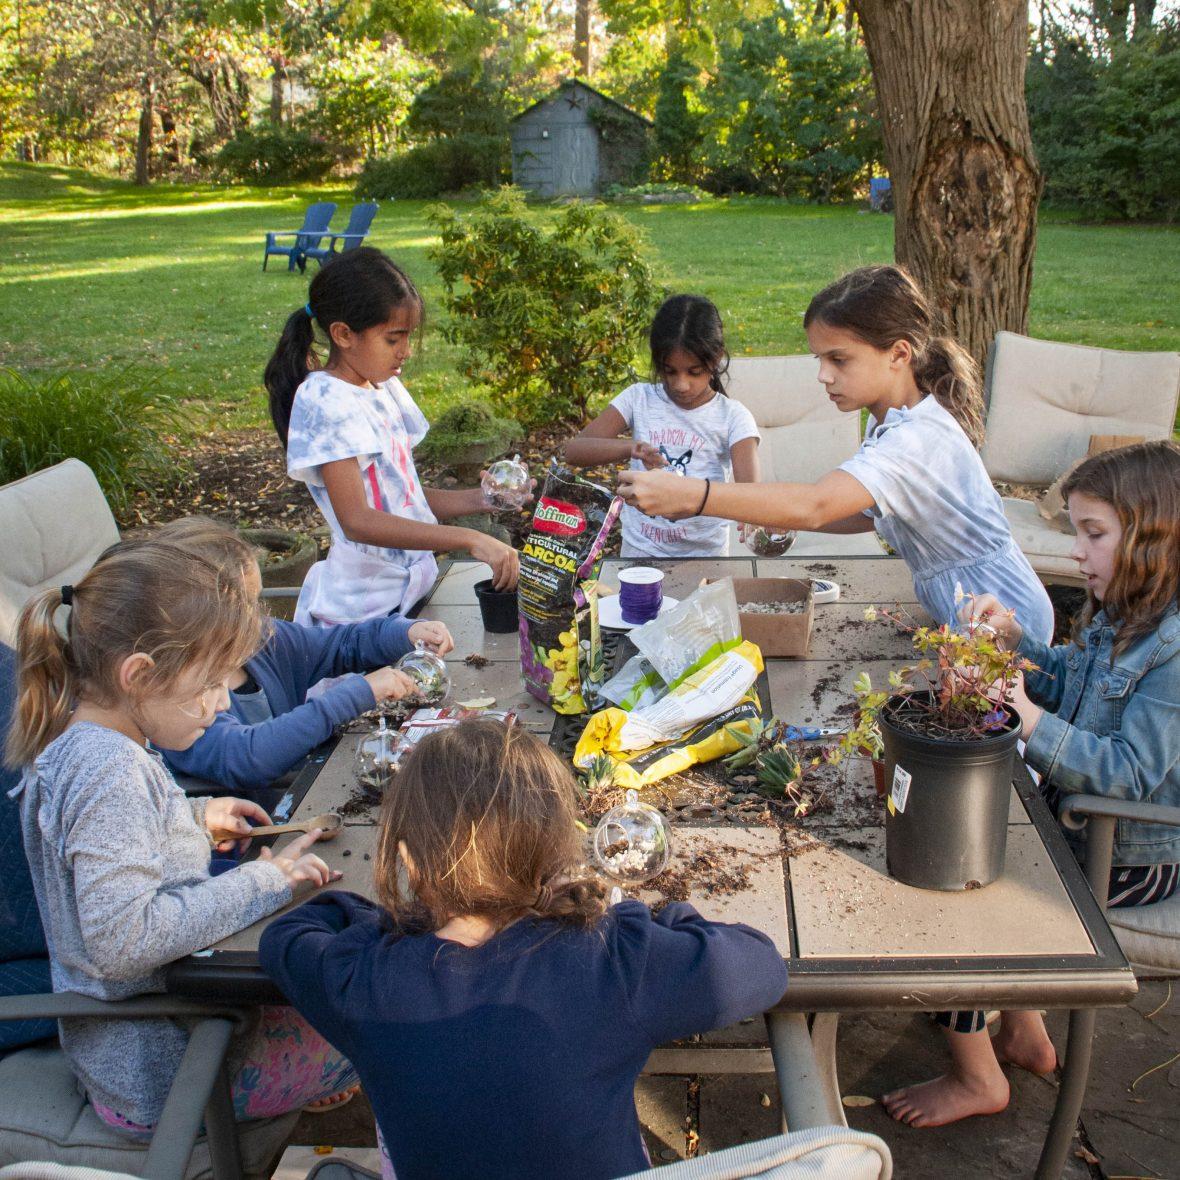 terrarium workshop enrichment program for students in bucks county pennsylvania